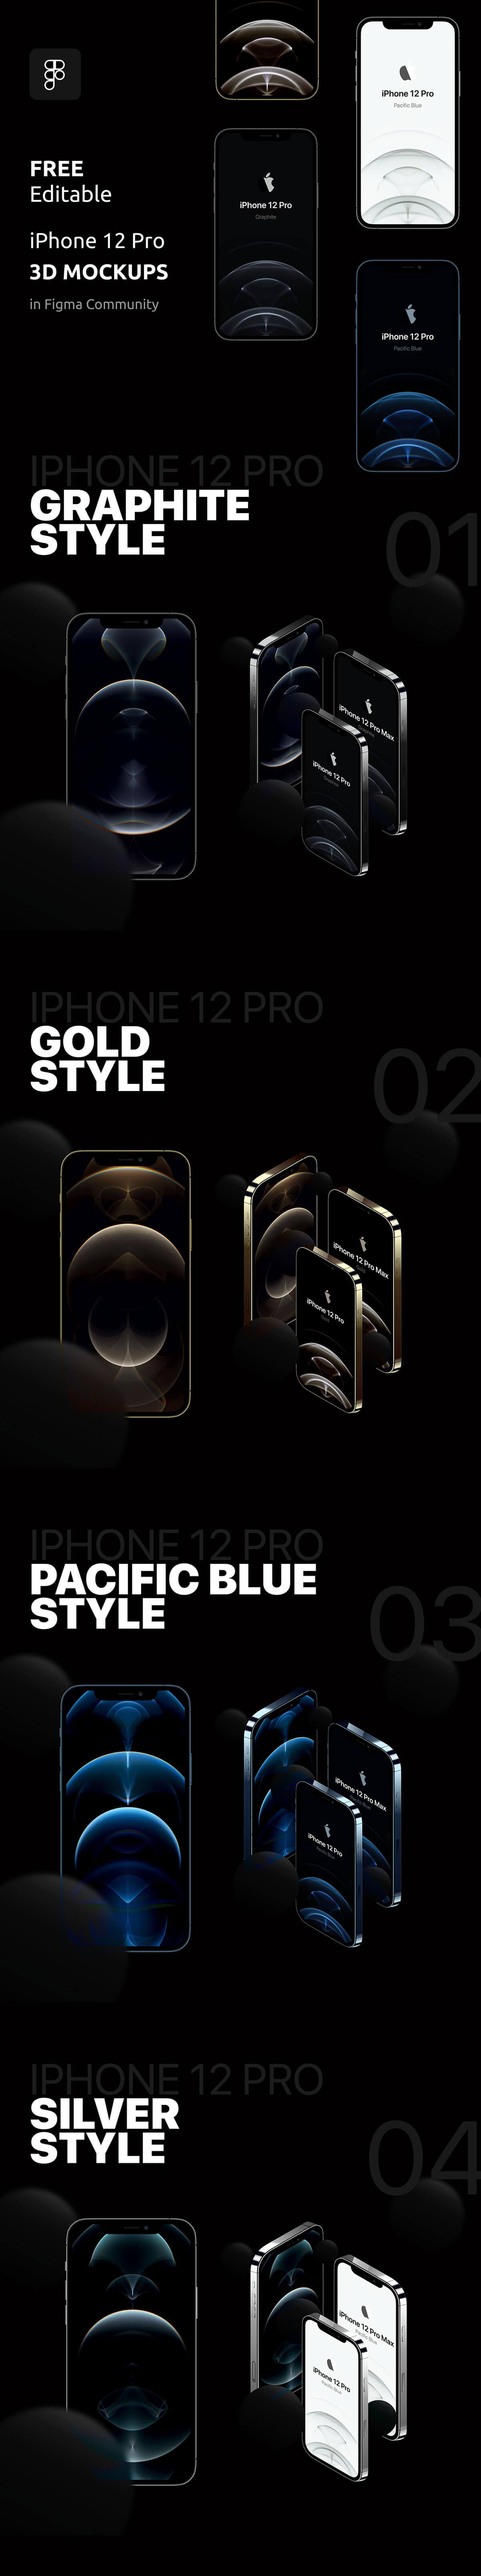 Free iPhone 12 3D Mockups